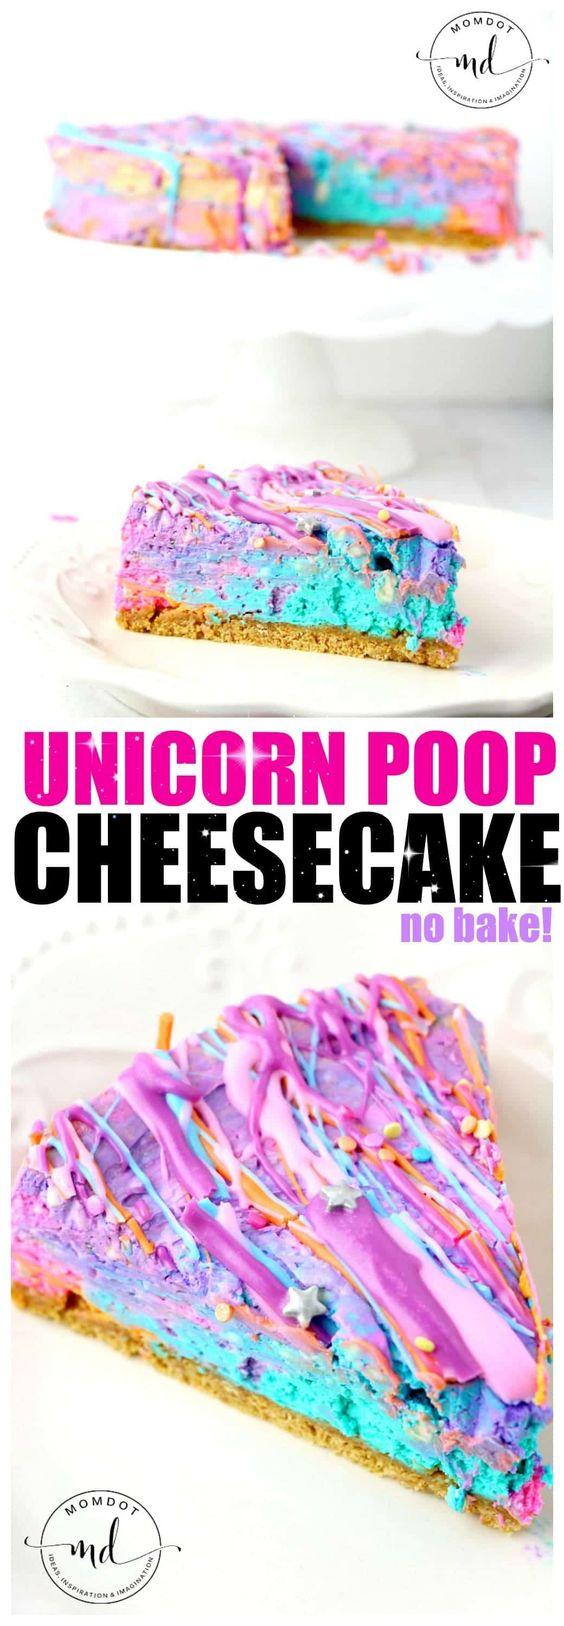 Unicorn desserts for a unicorn party: No Bake Unicorn Poop Cheesecake